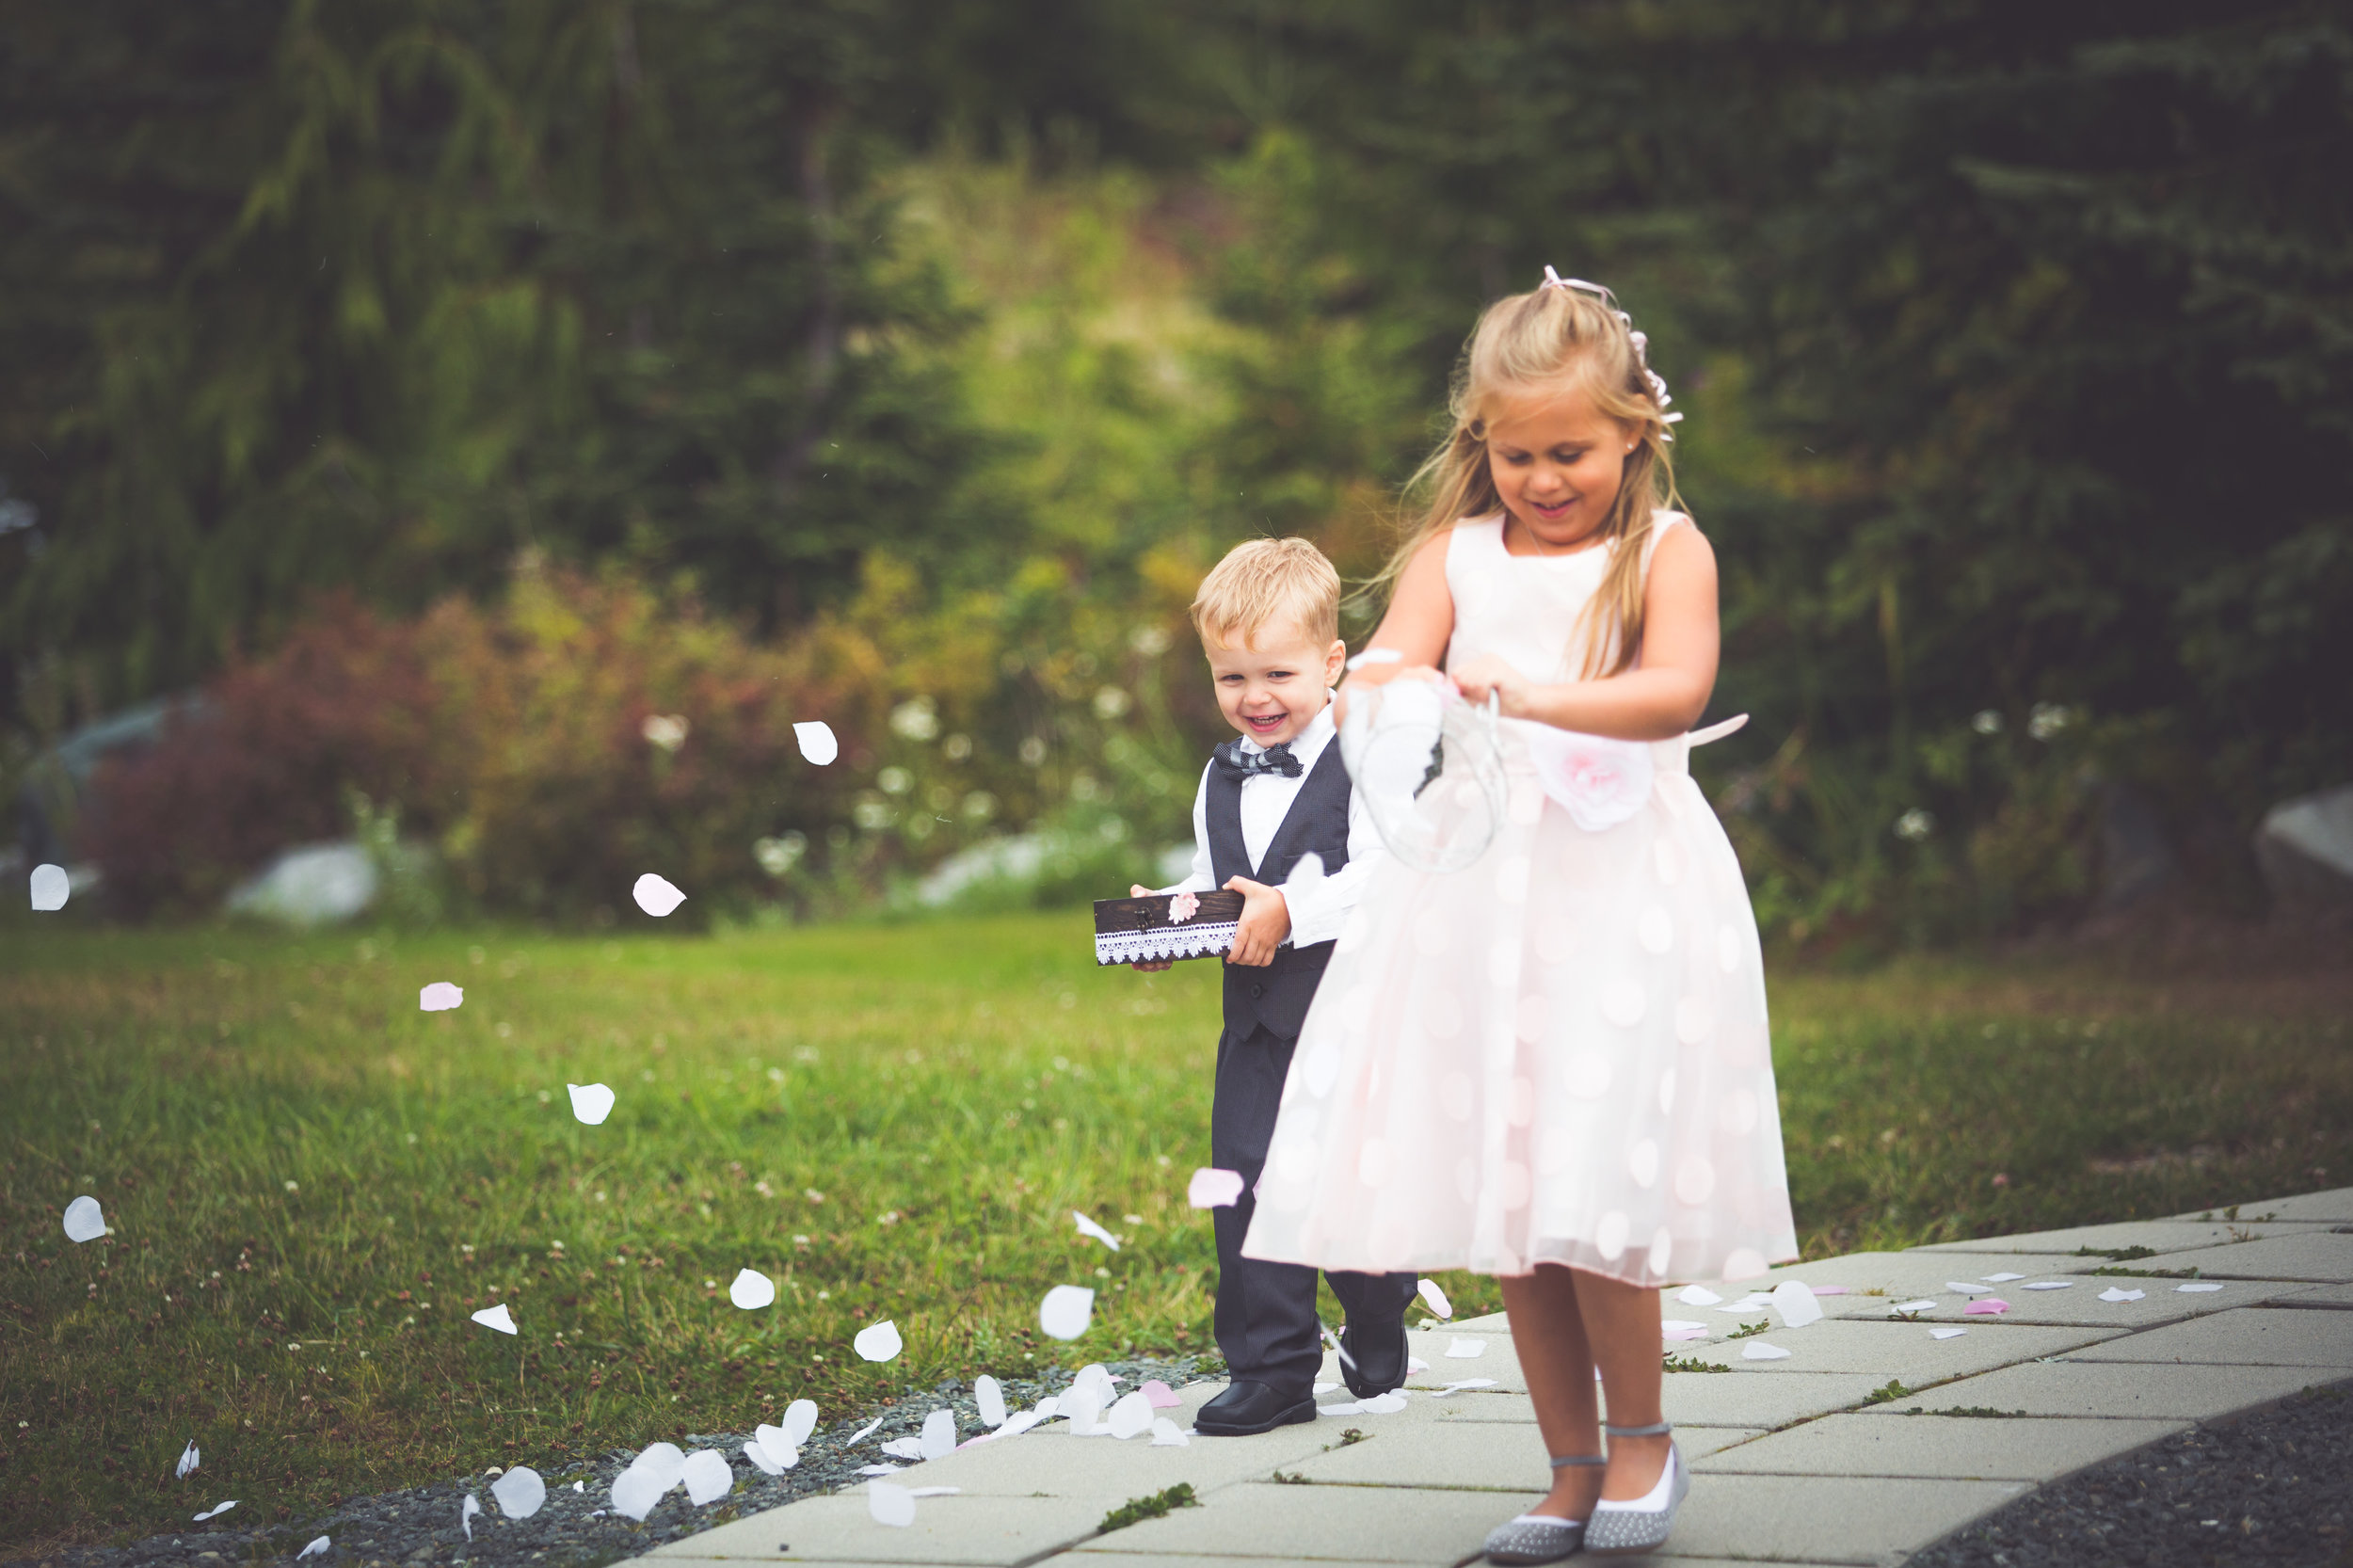 mount washington resort wedding flower girl and ring bearer